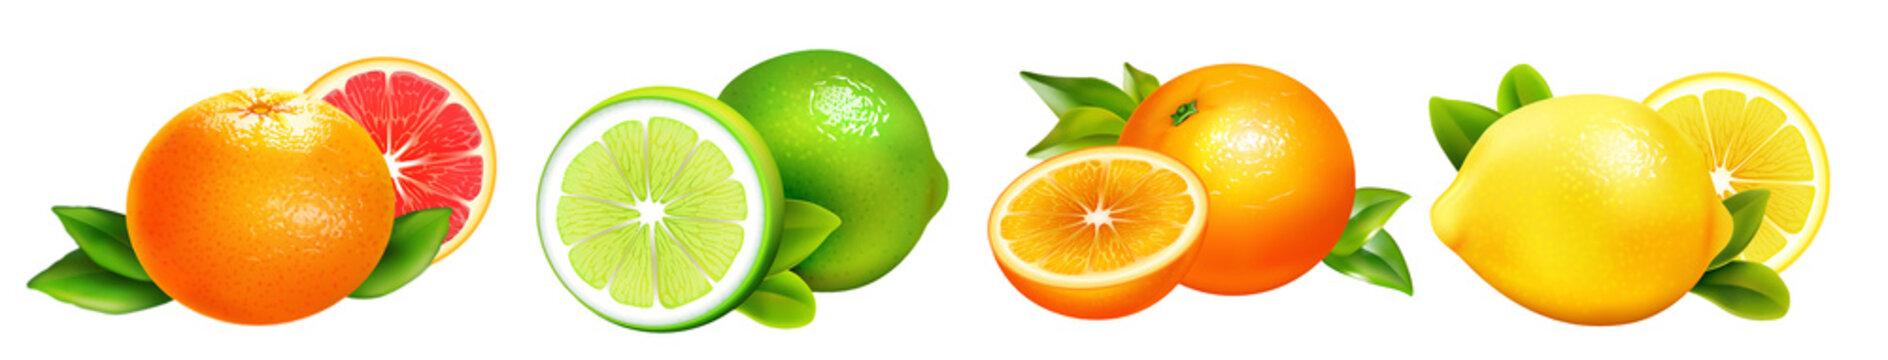 Citrus Fruit orange, grapefruit, lemon, lime